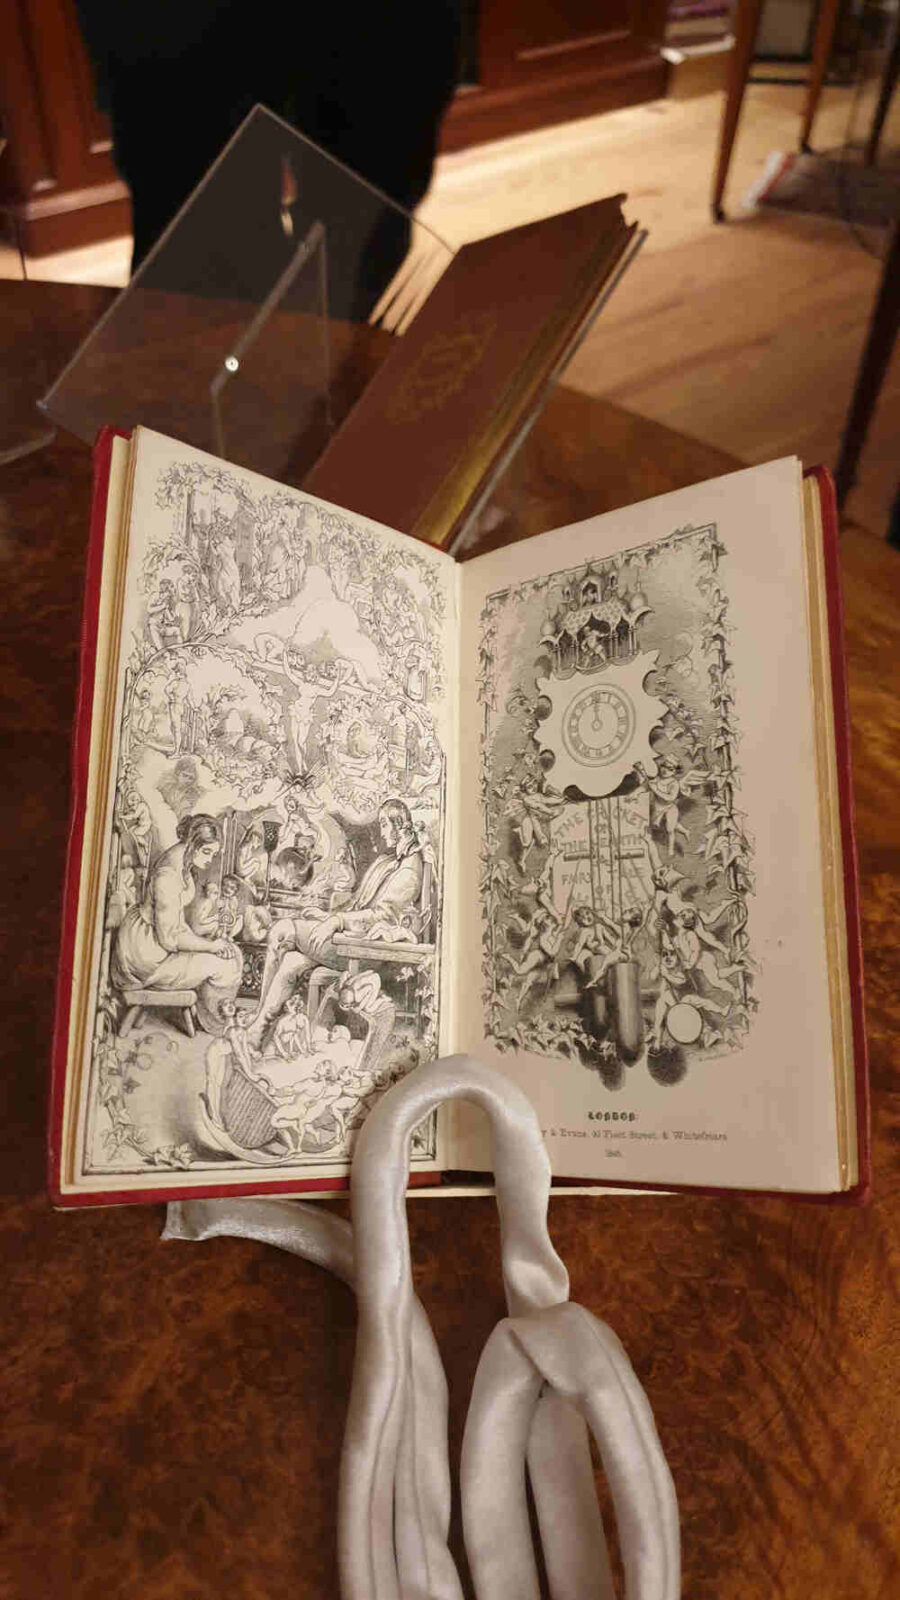 Charles Dickens Christmas books